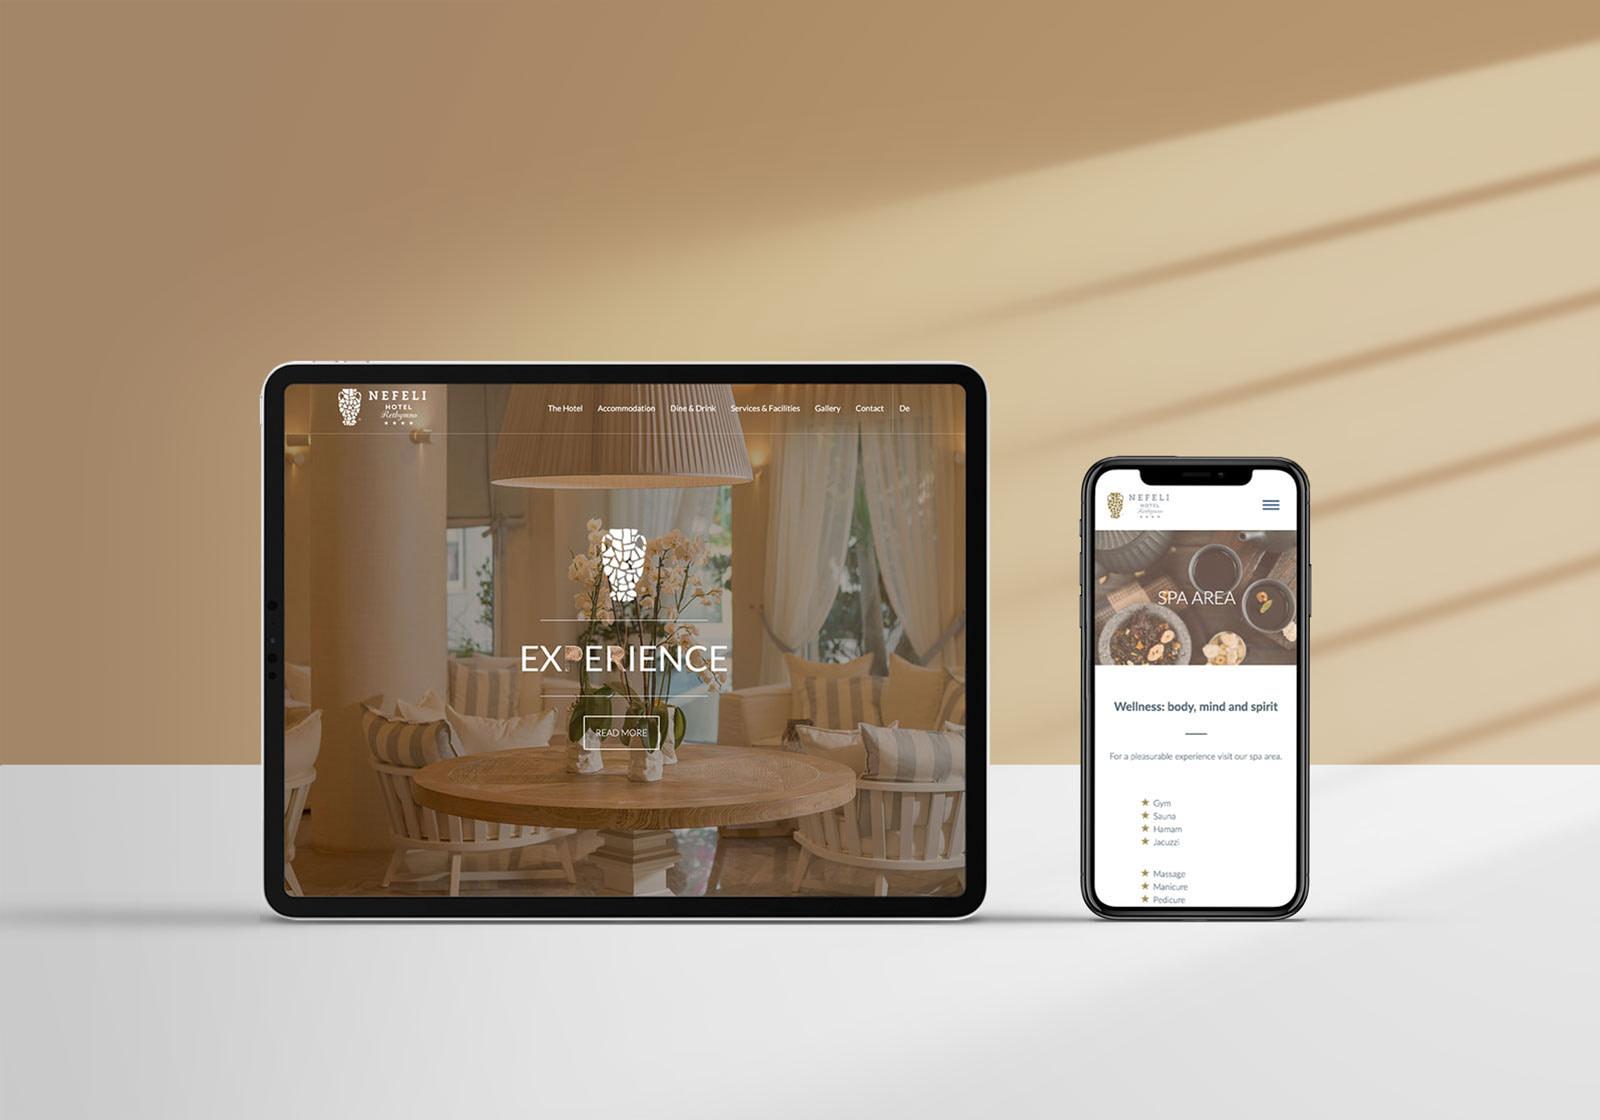 nefeli-hotel-website